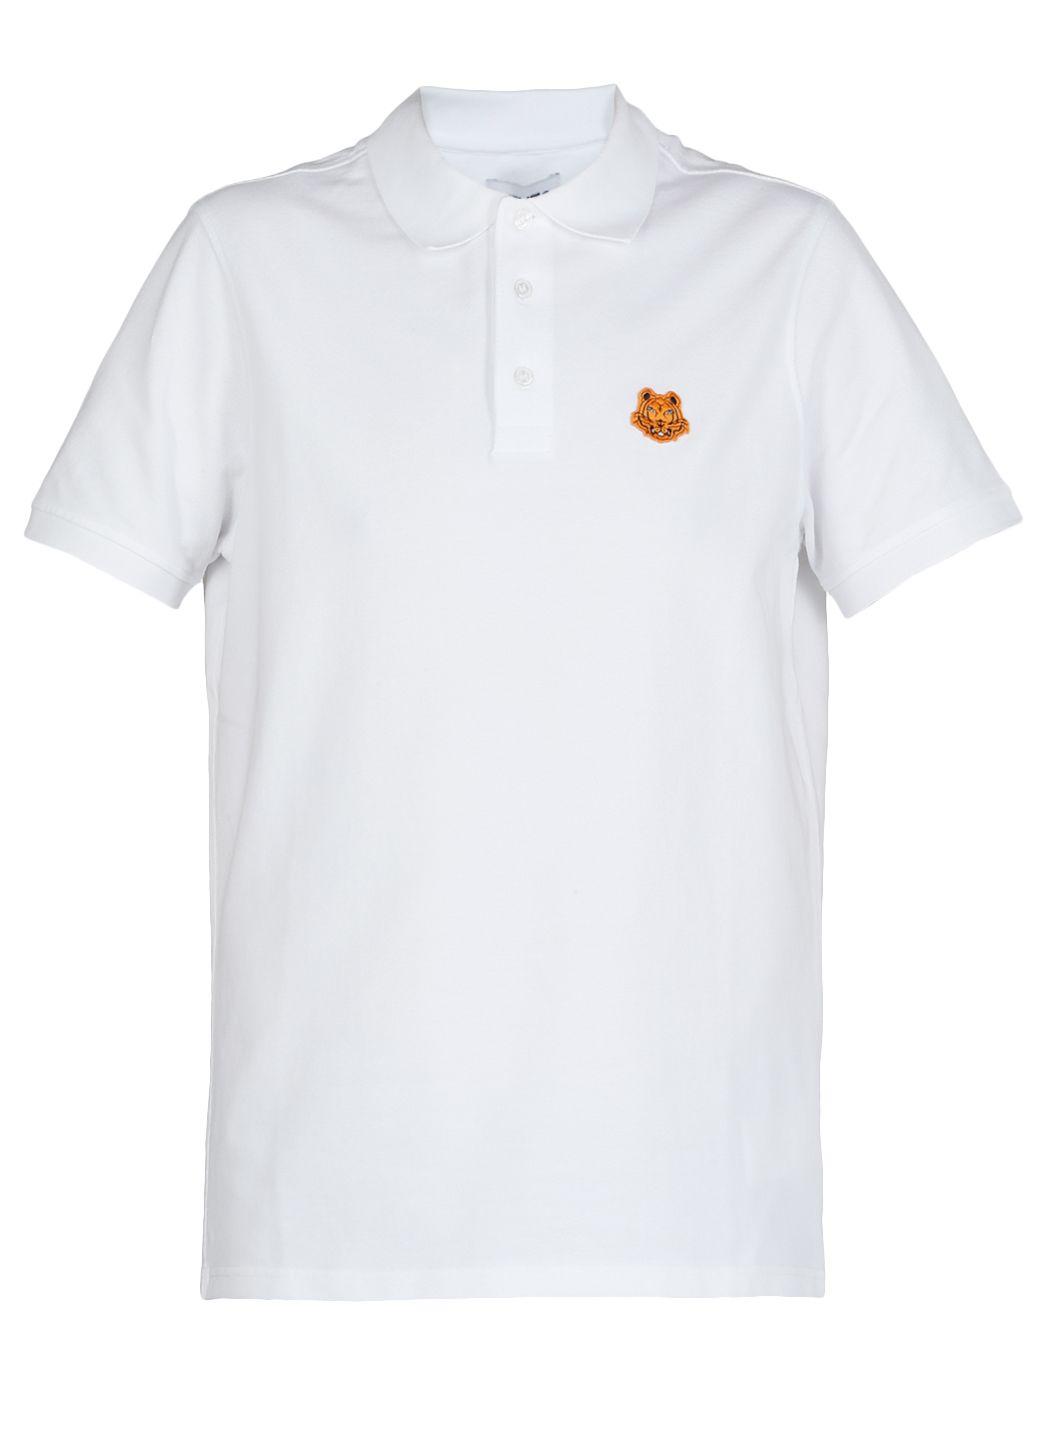 Tiger crest polo